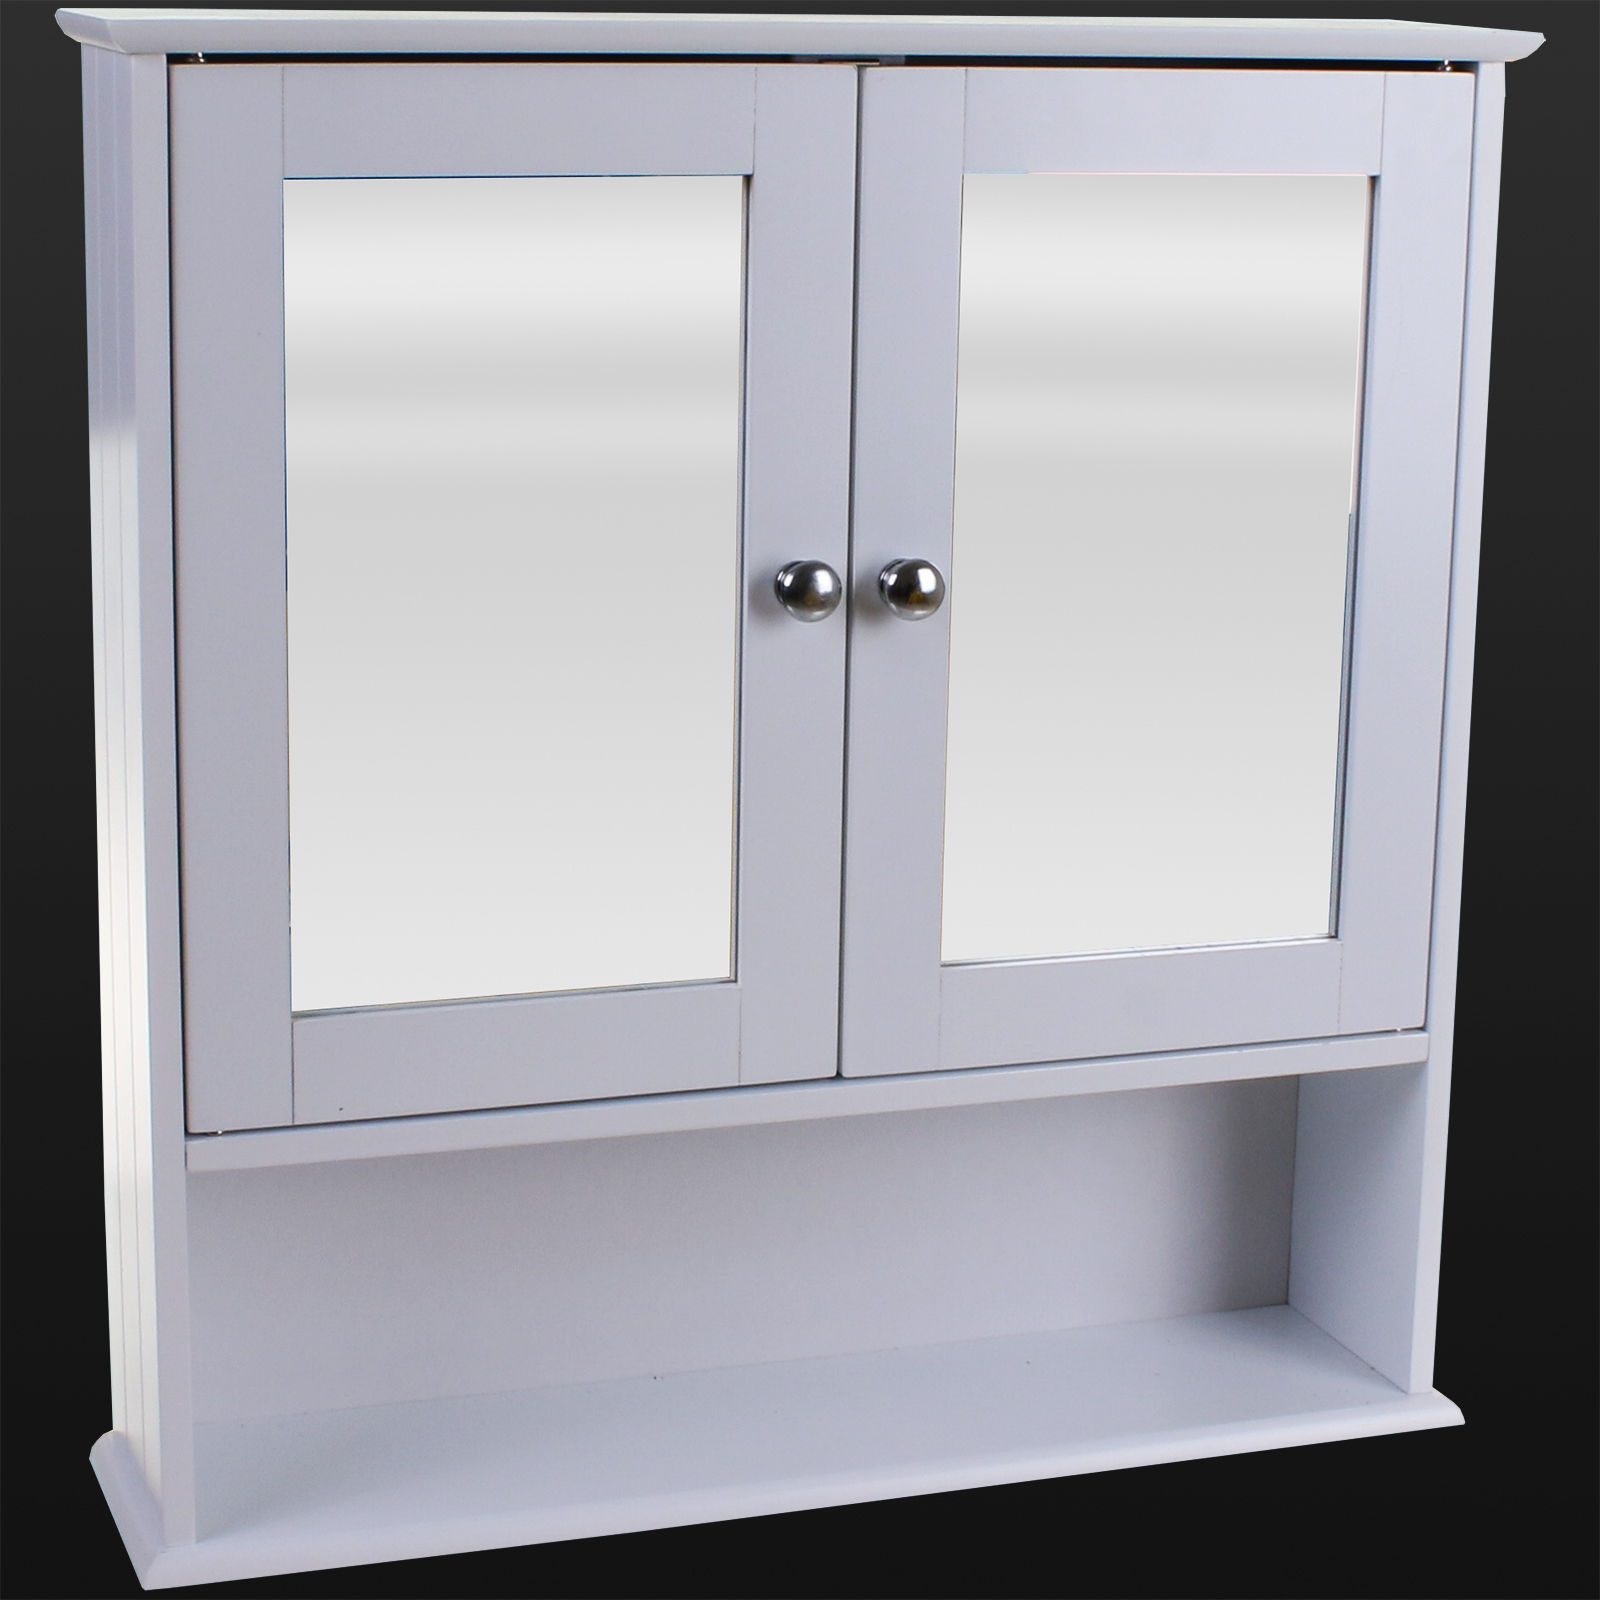 Bathroom Storage Unit Cabinet White Shelves Glass Under Sink Basin